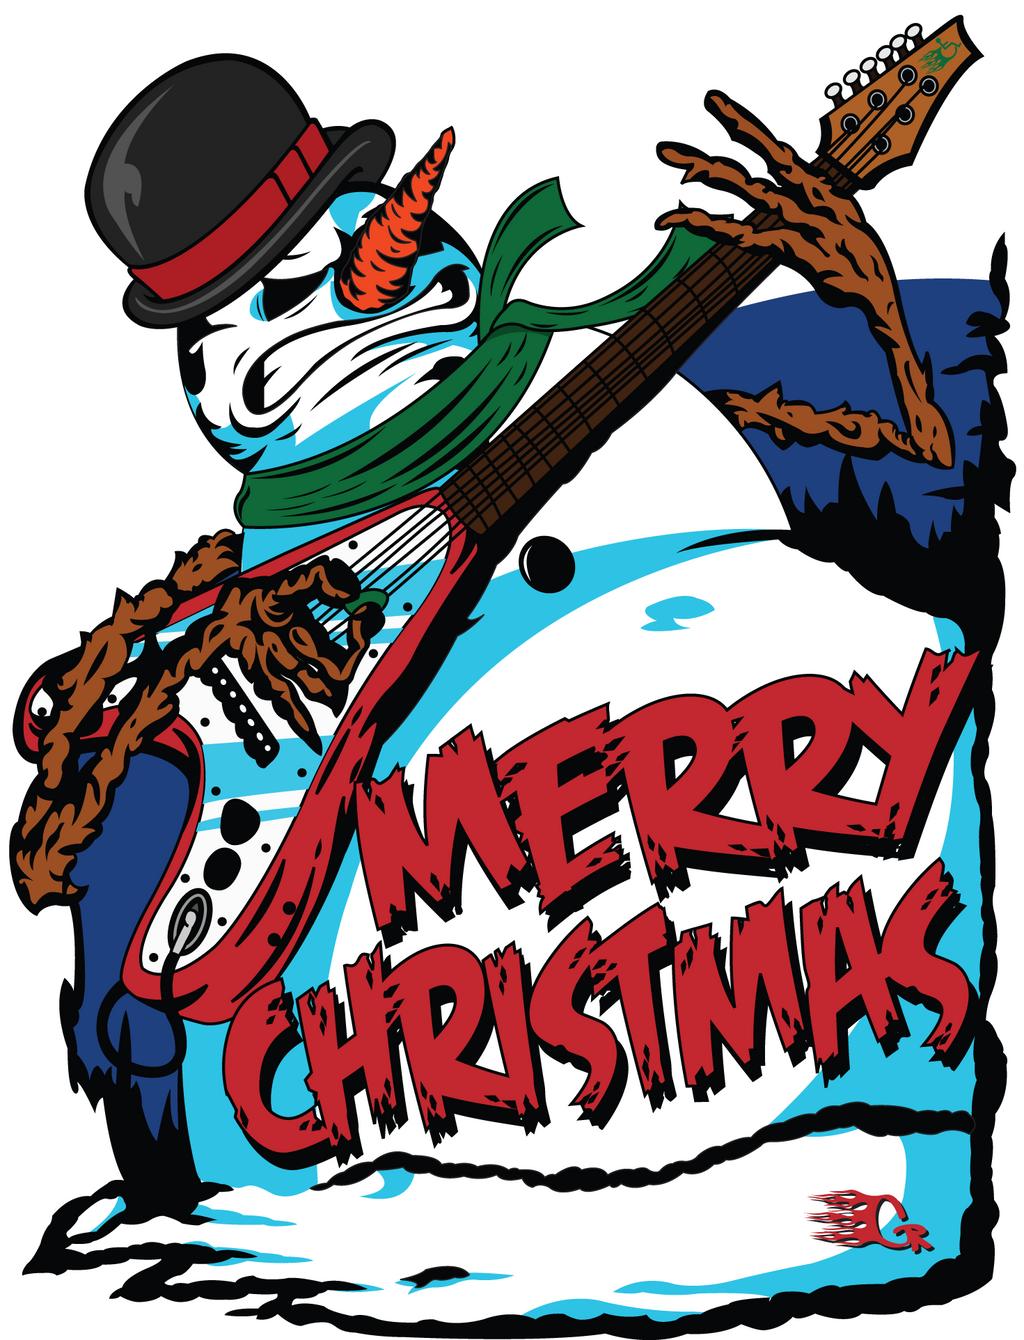 Heavy metal snowman by gaberios on deviantart